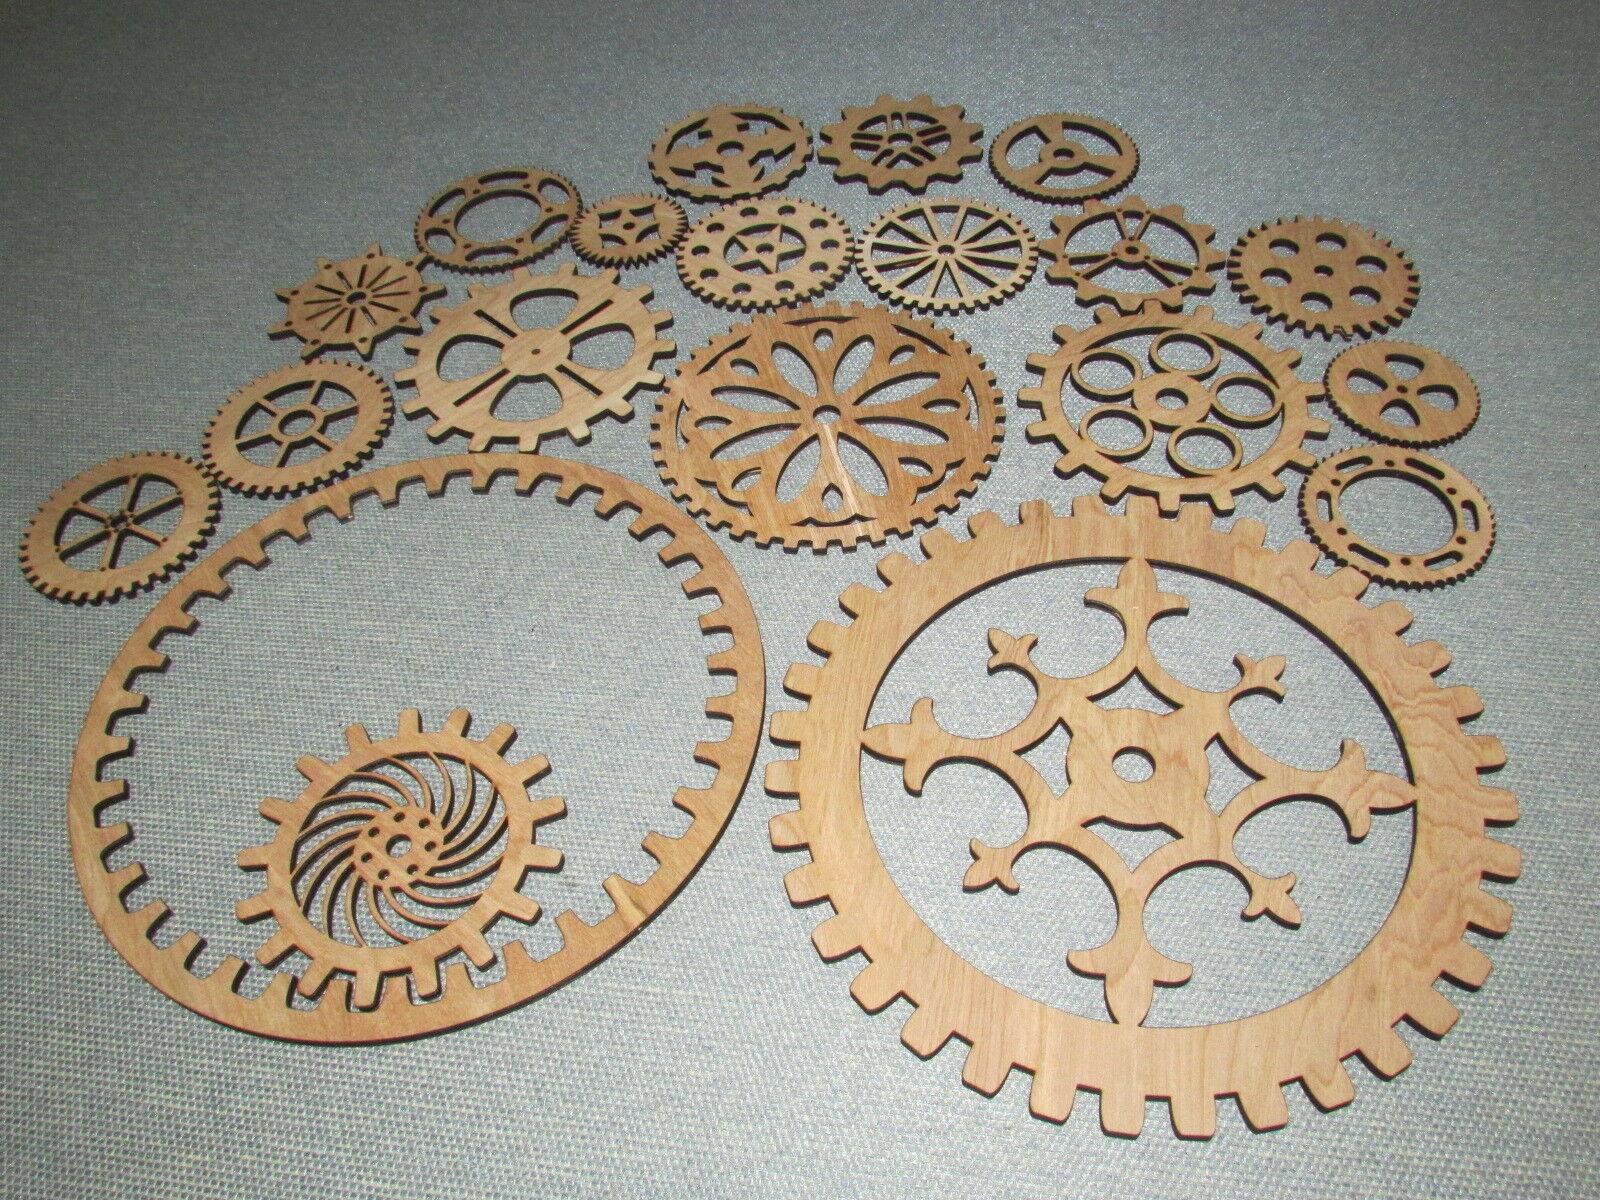 Gears Lot 3, 20 Various Größes & Styles of Wood Wooden Steampunk Wall Art Decor